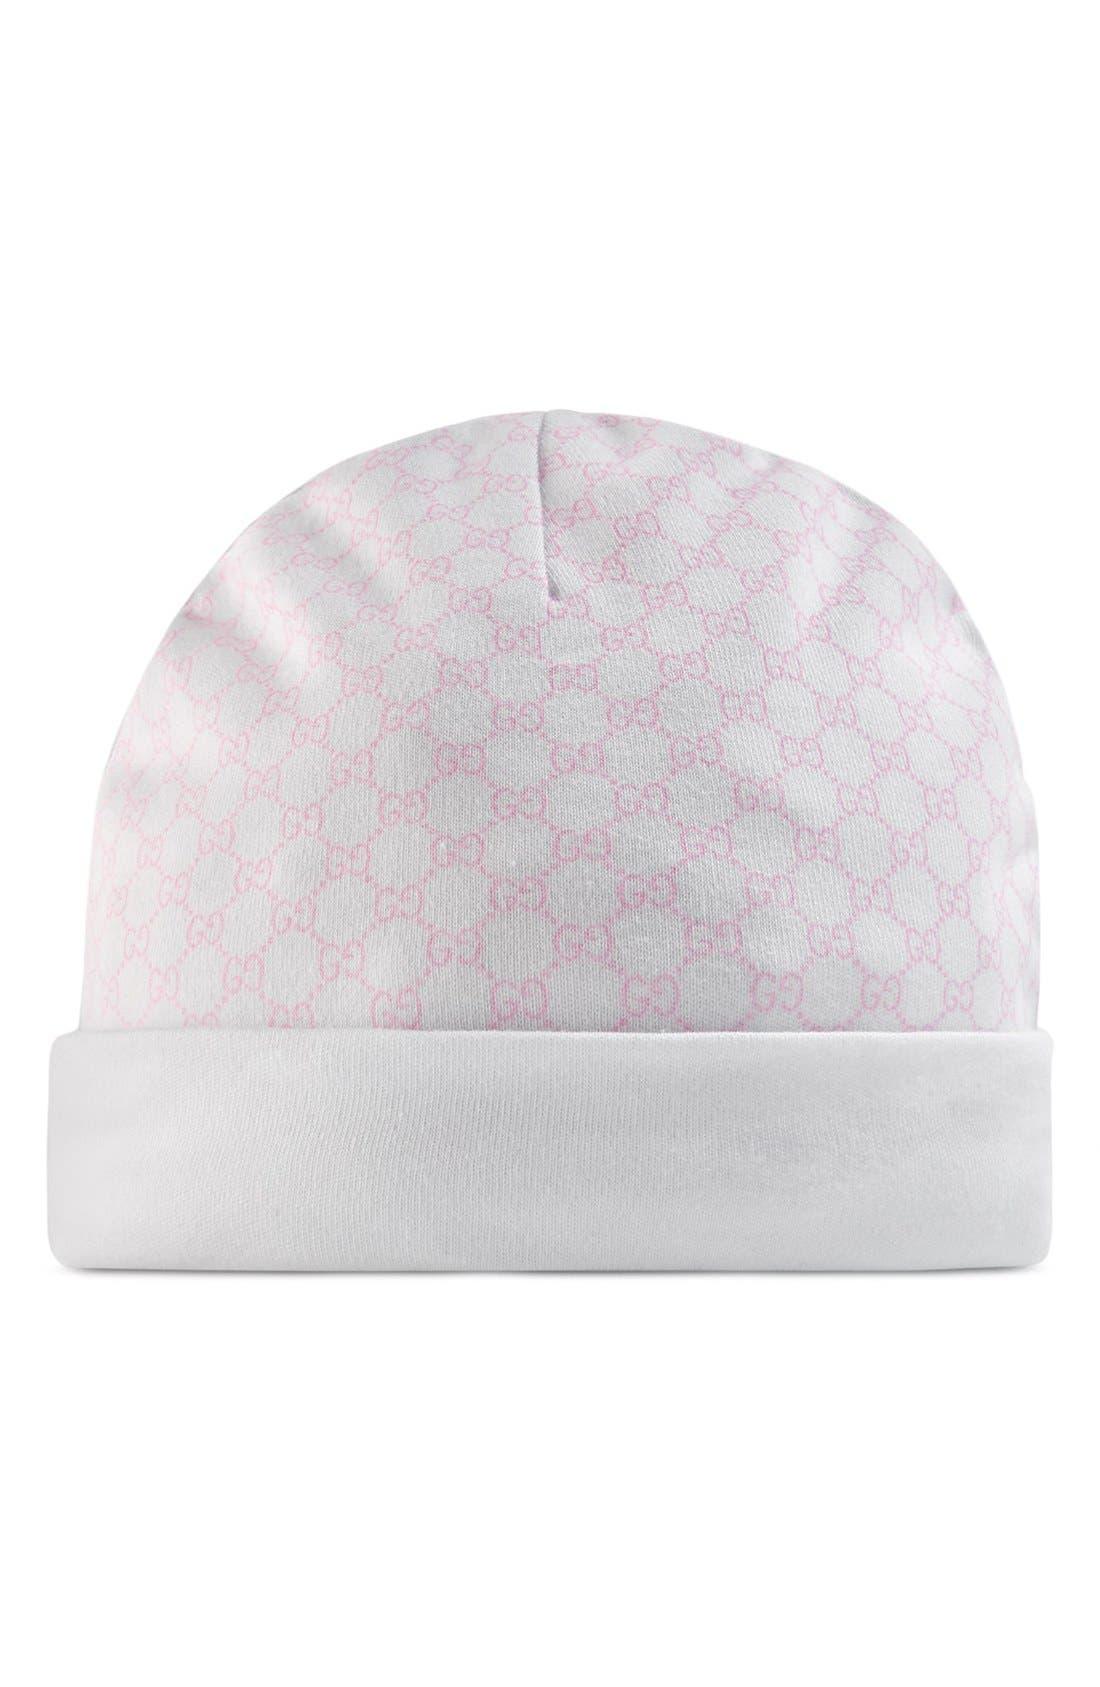 Logo Pattern Knit Cap,                         Main,                         color, Ivory/ Pink